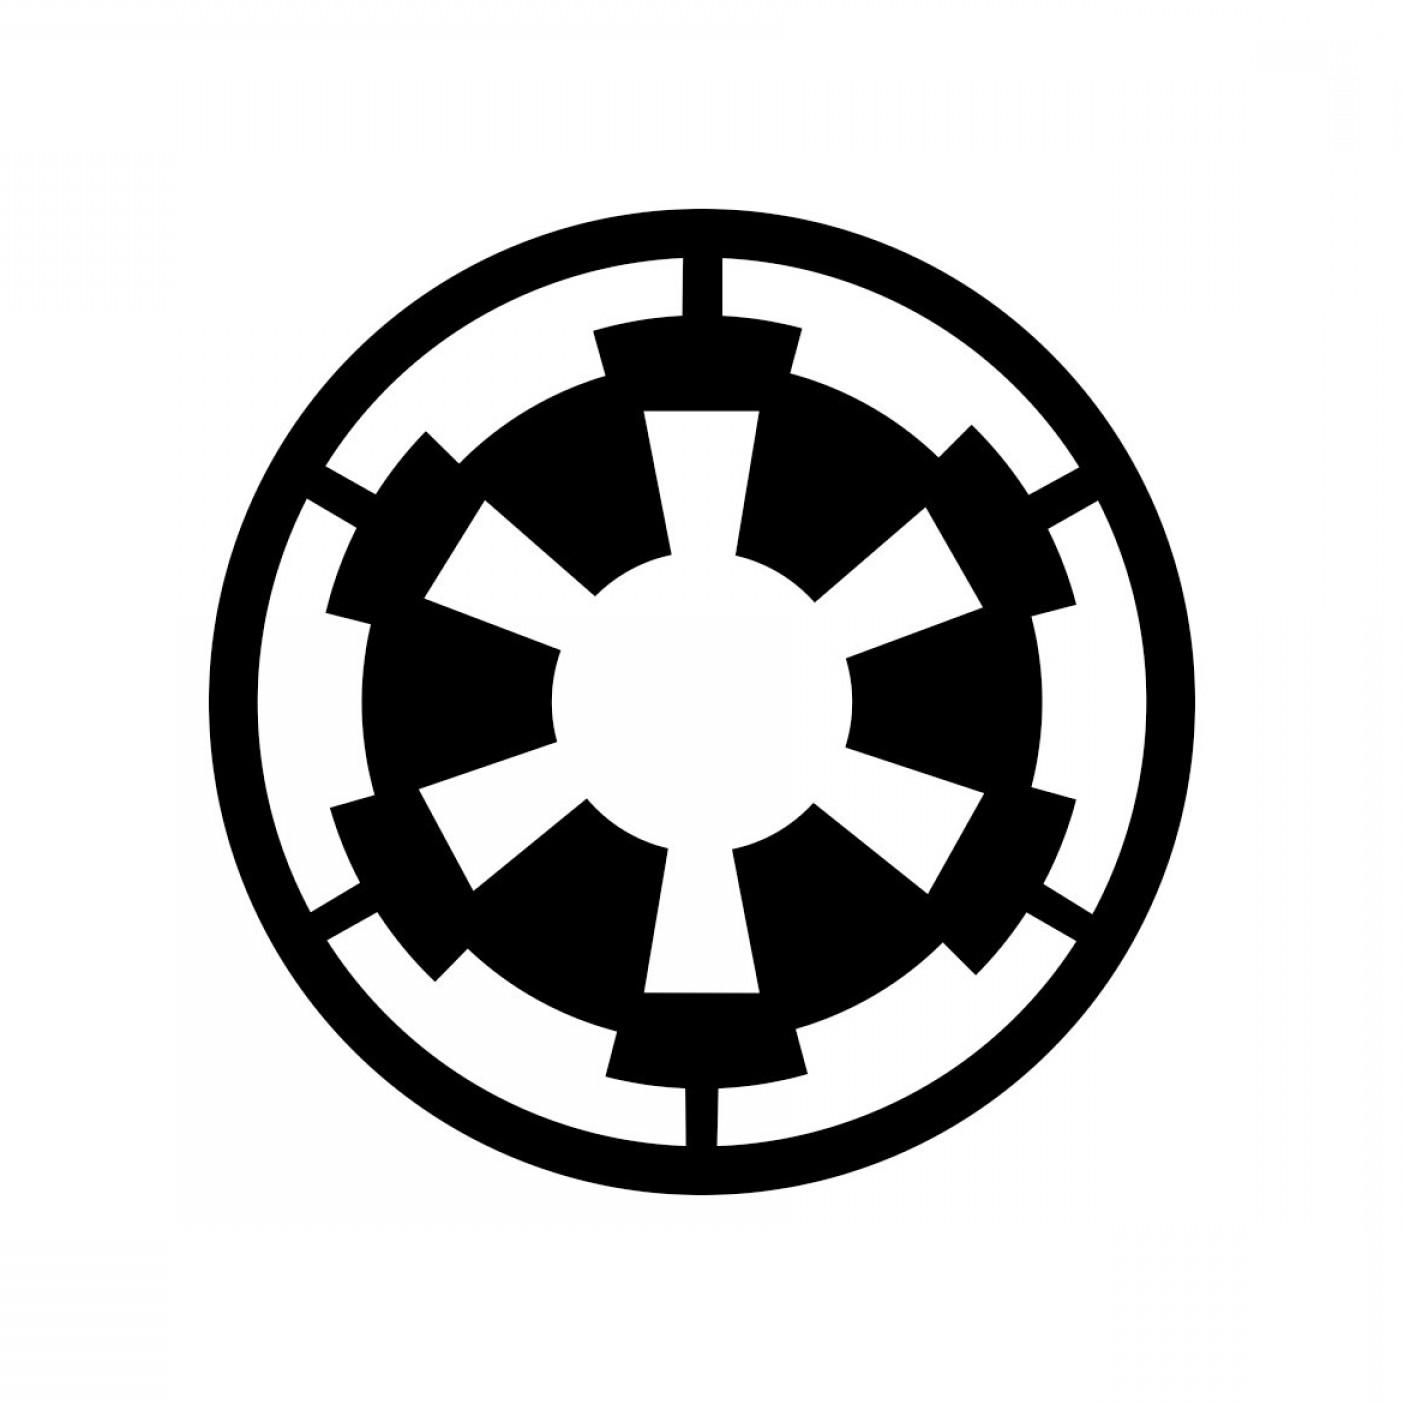 1404x1404 Star Wars Symbol Vector Shopatcloth